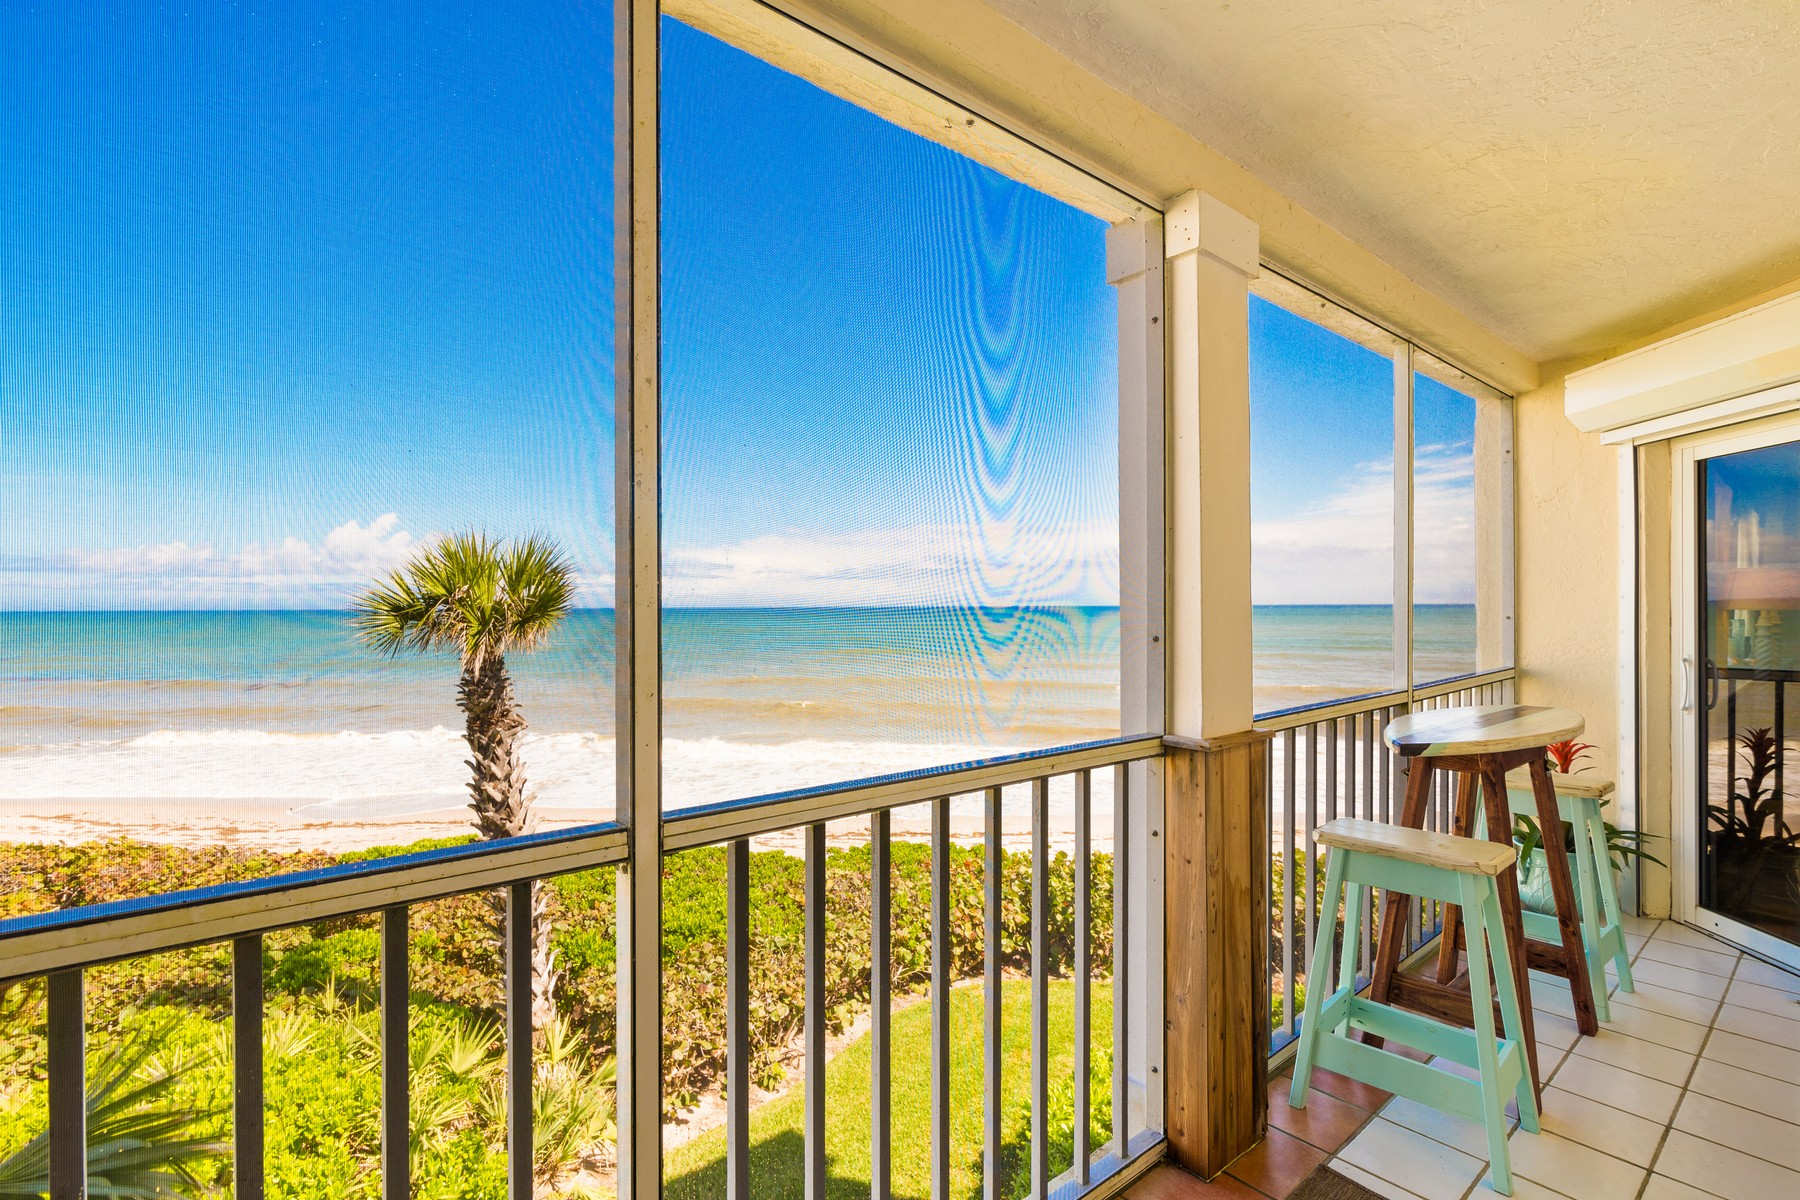 Condominium for Sale at Sea Oaks Oceanfront Condo 8880 N Sea Oaks Way #203 Vero Beach, Florida 32963 United States